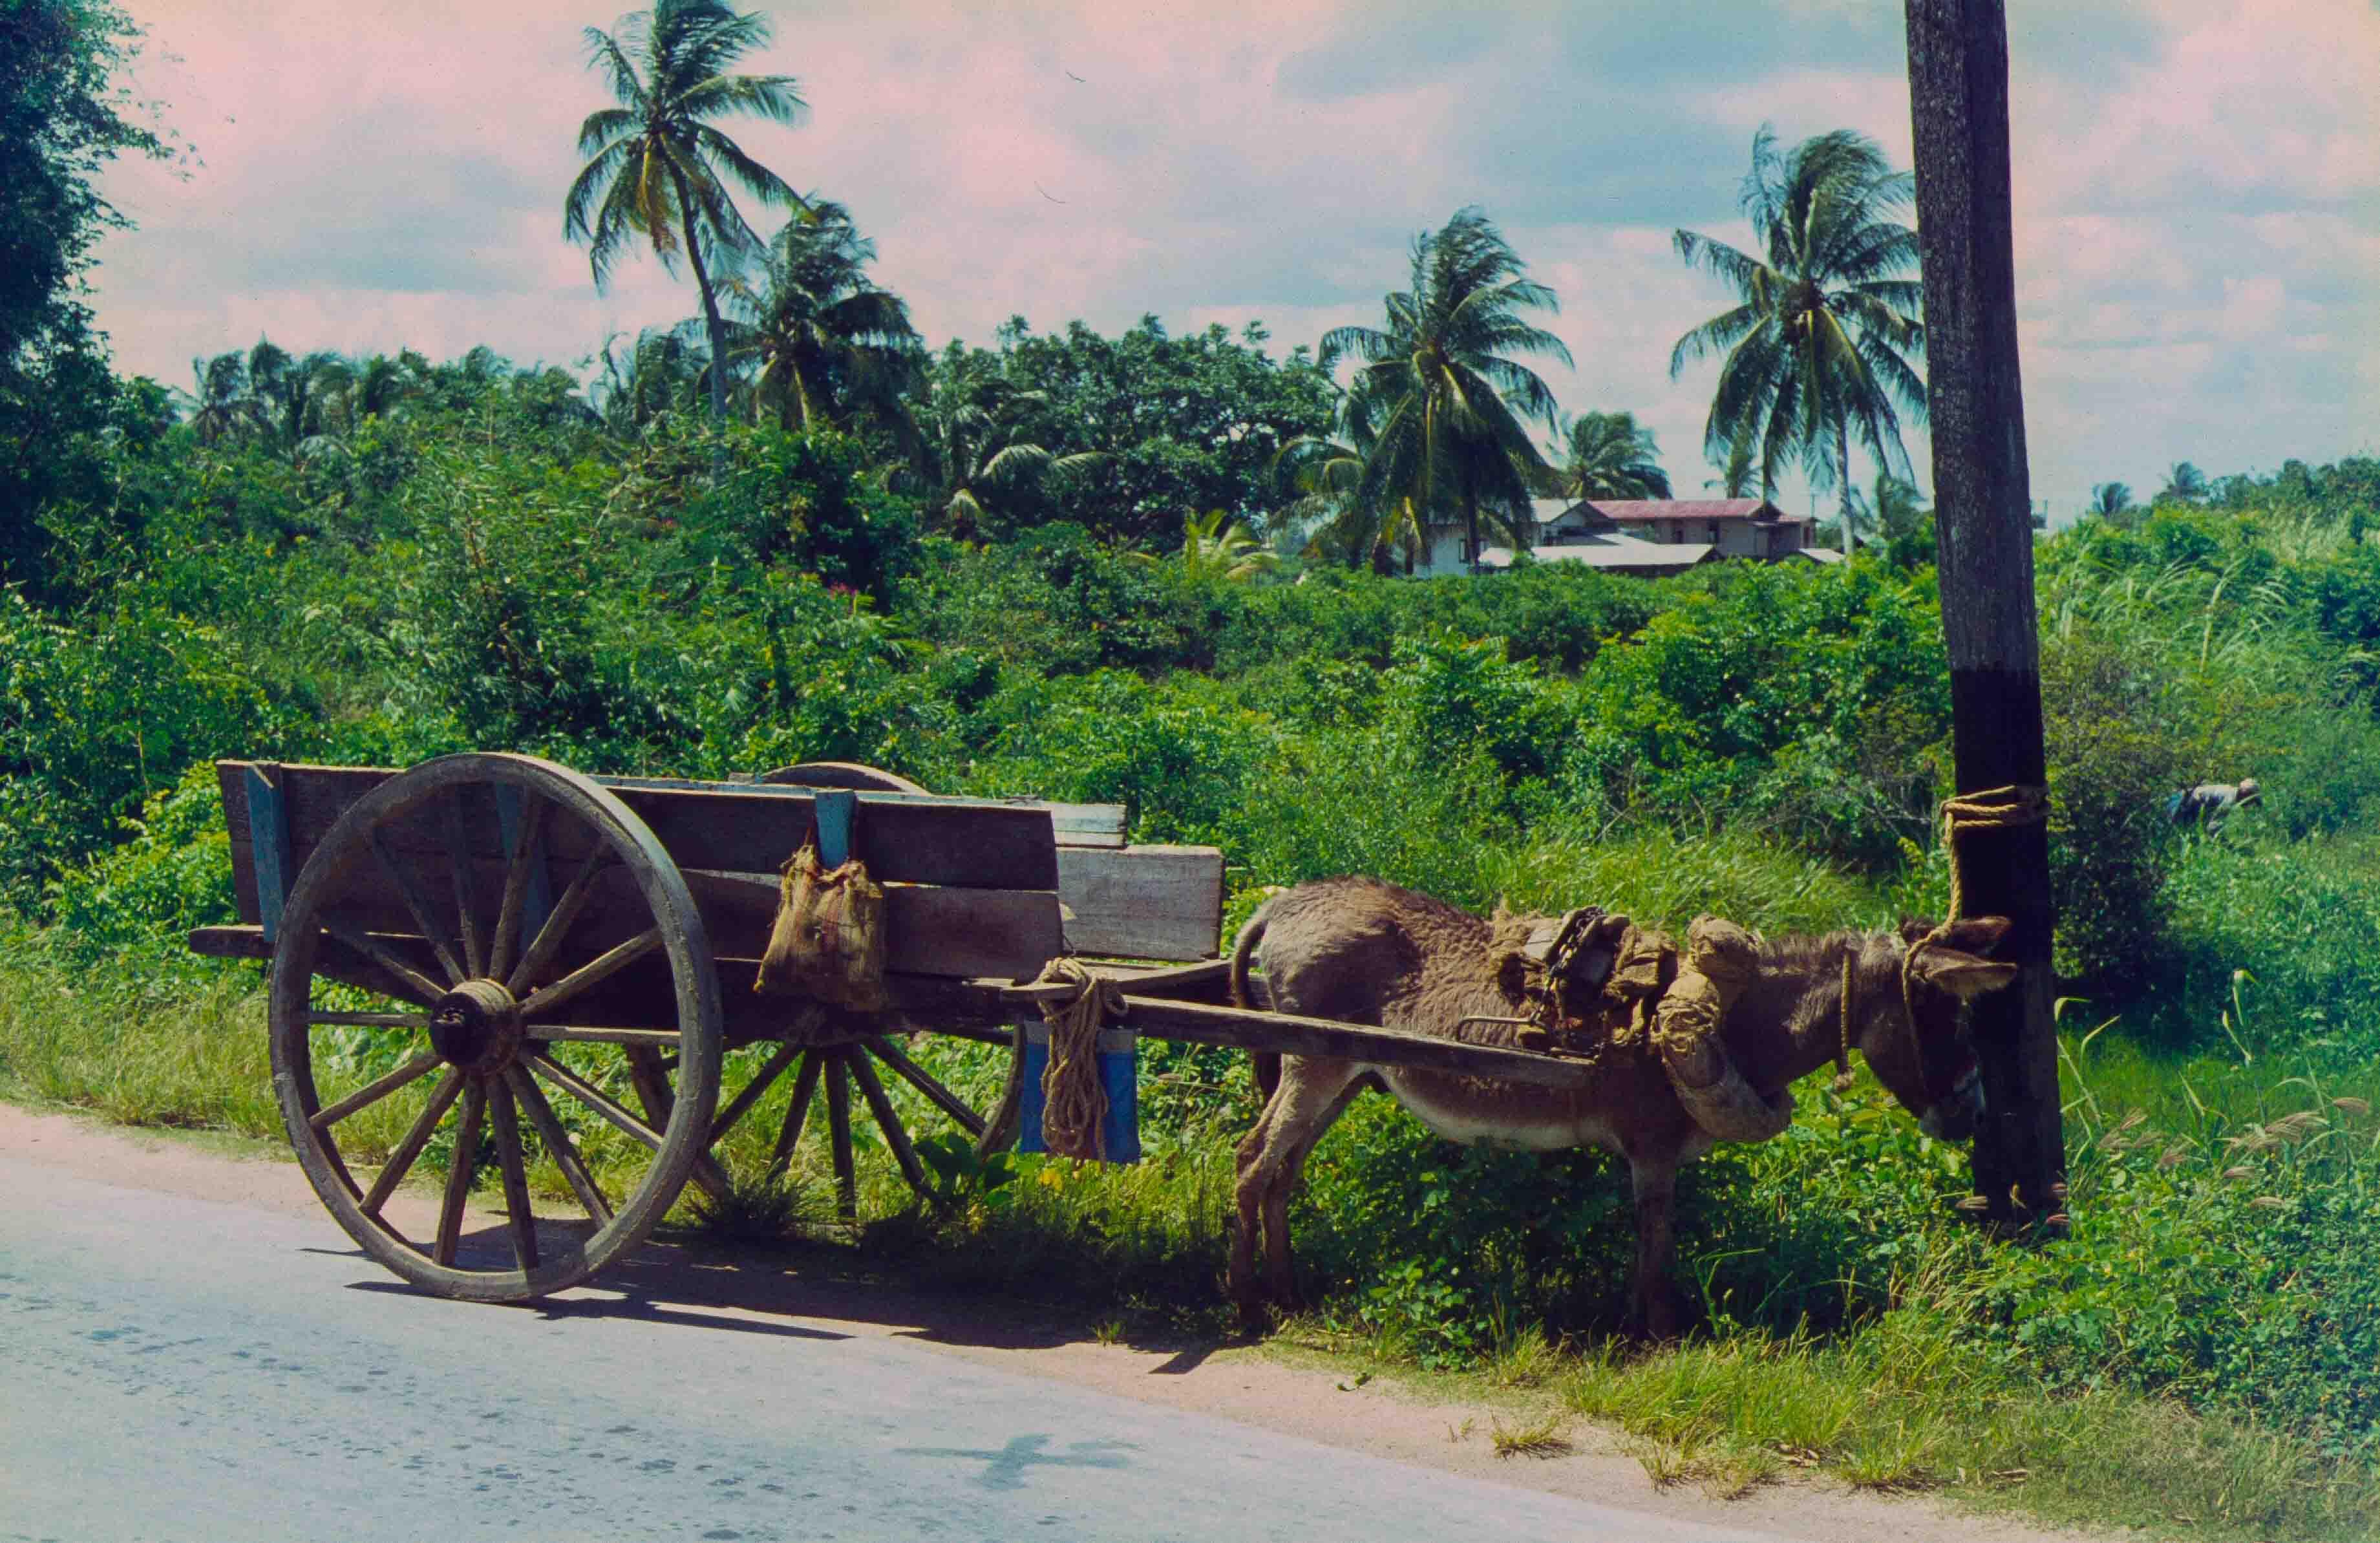 331. Suriname